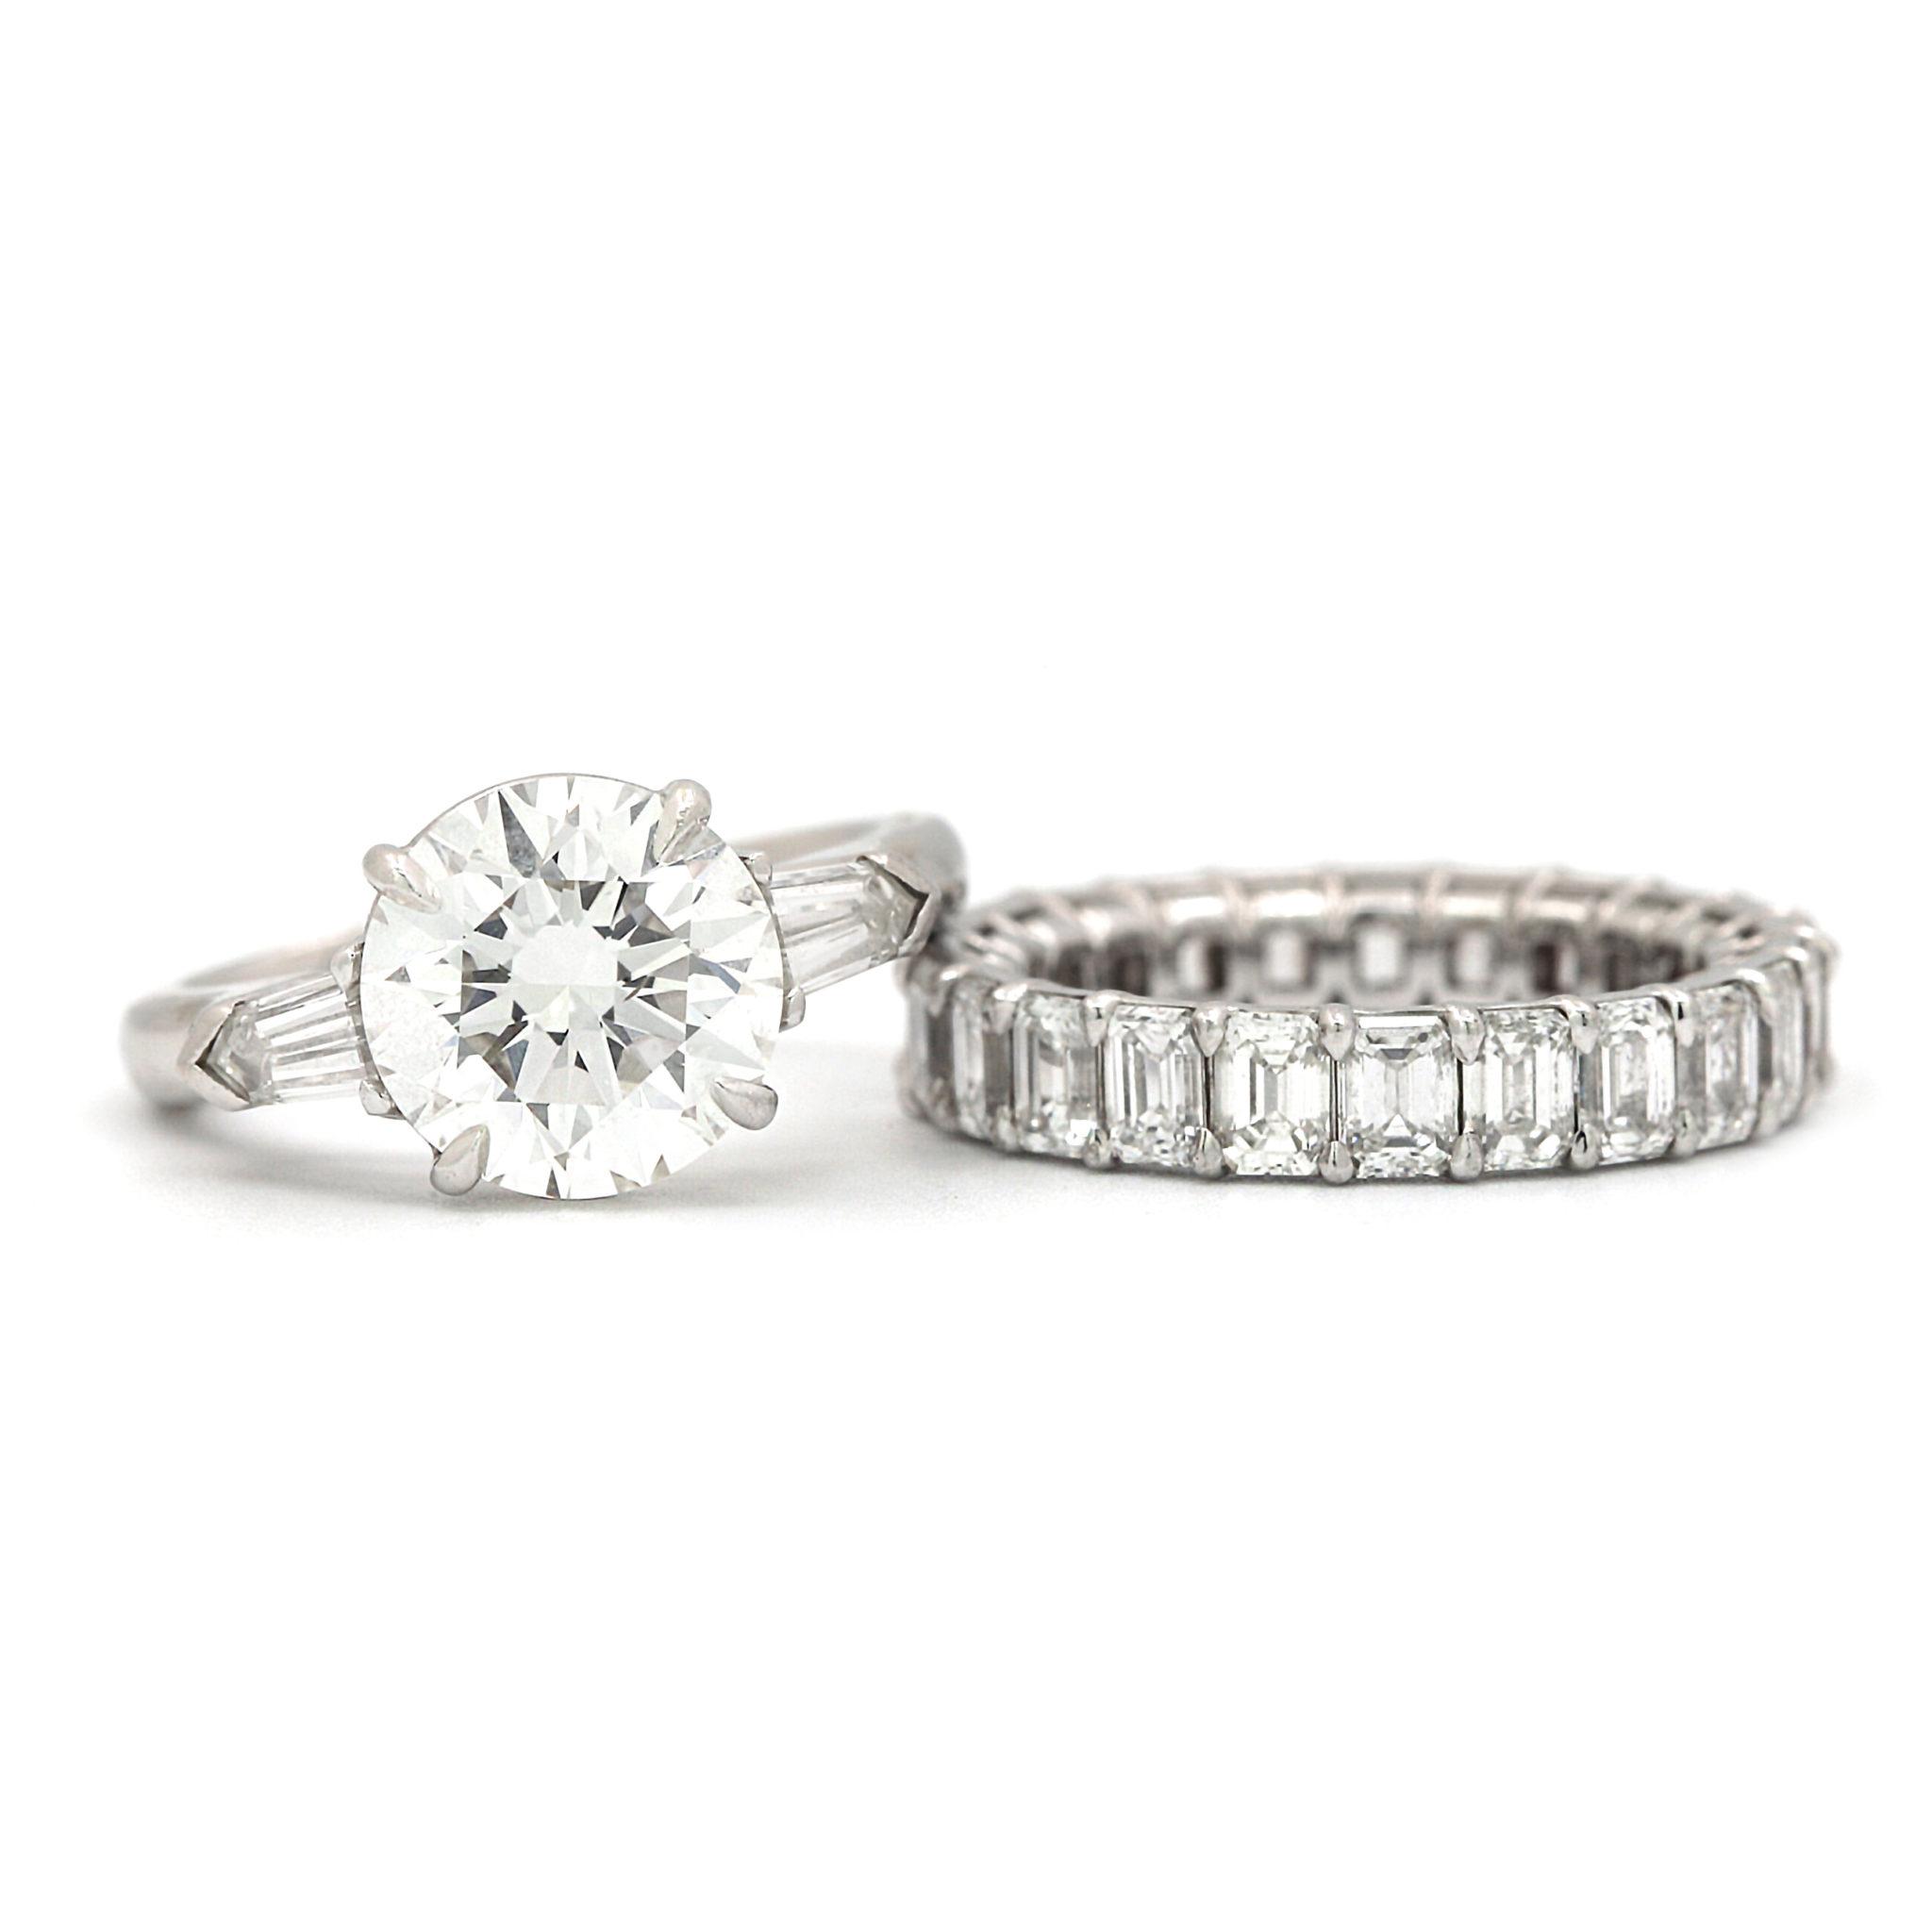 Leeser Diamonds – Jewelry Gallery – 8